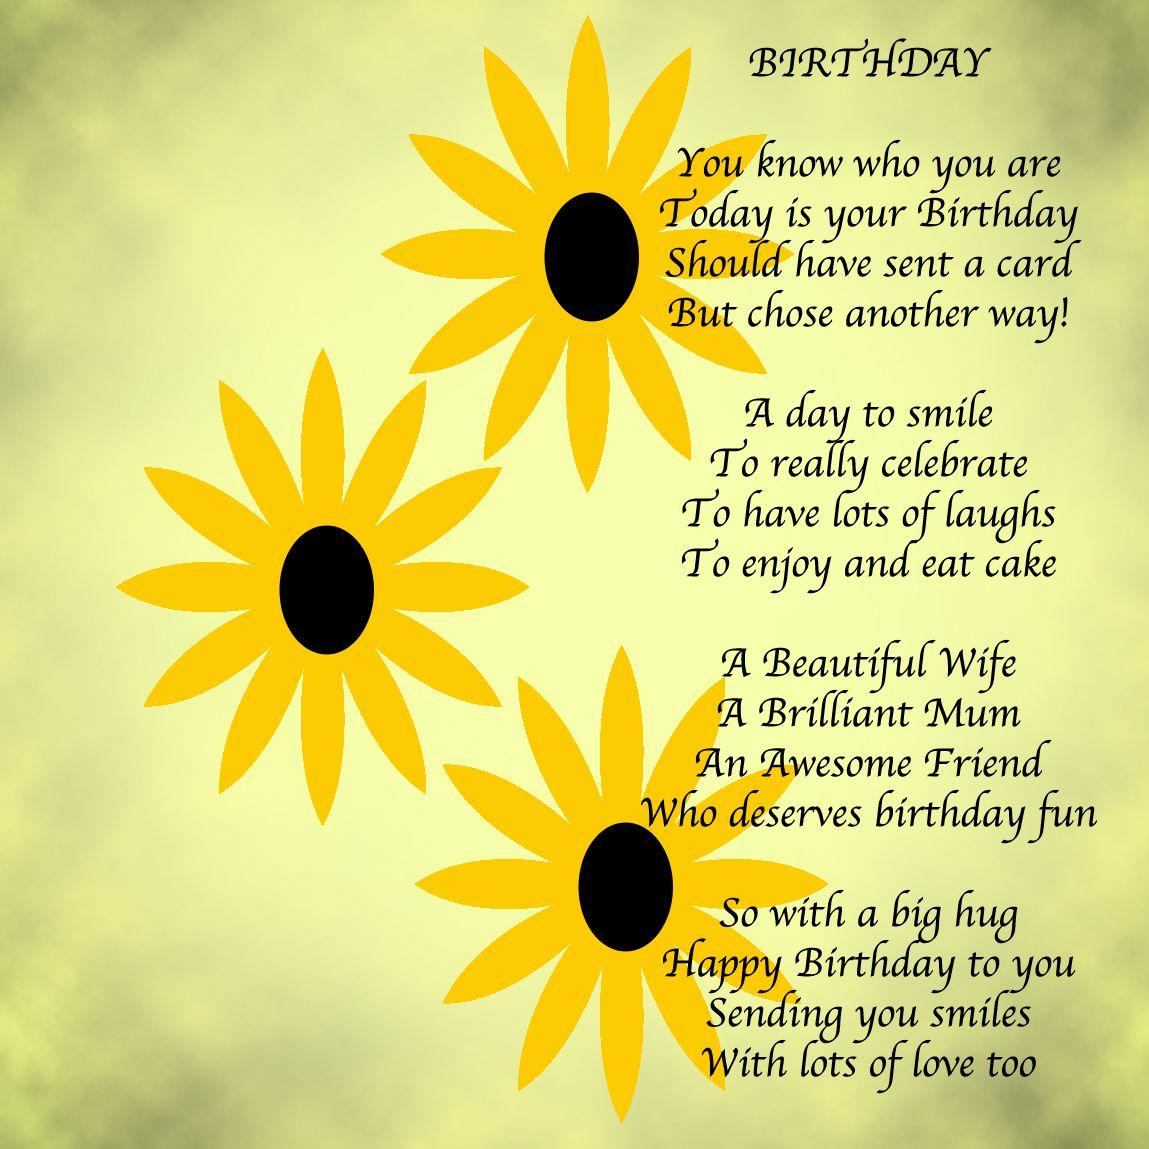 A Birthday Message Birthday messages, Messages and